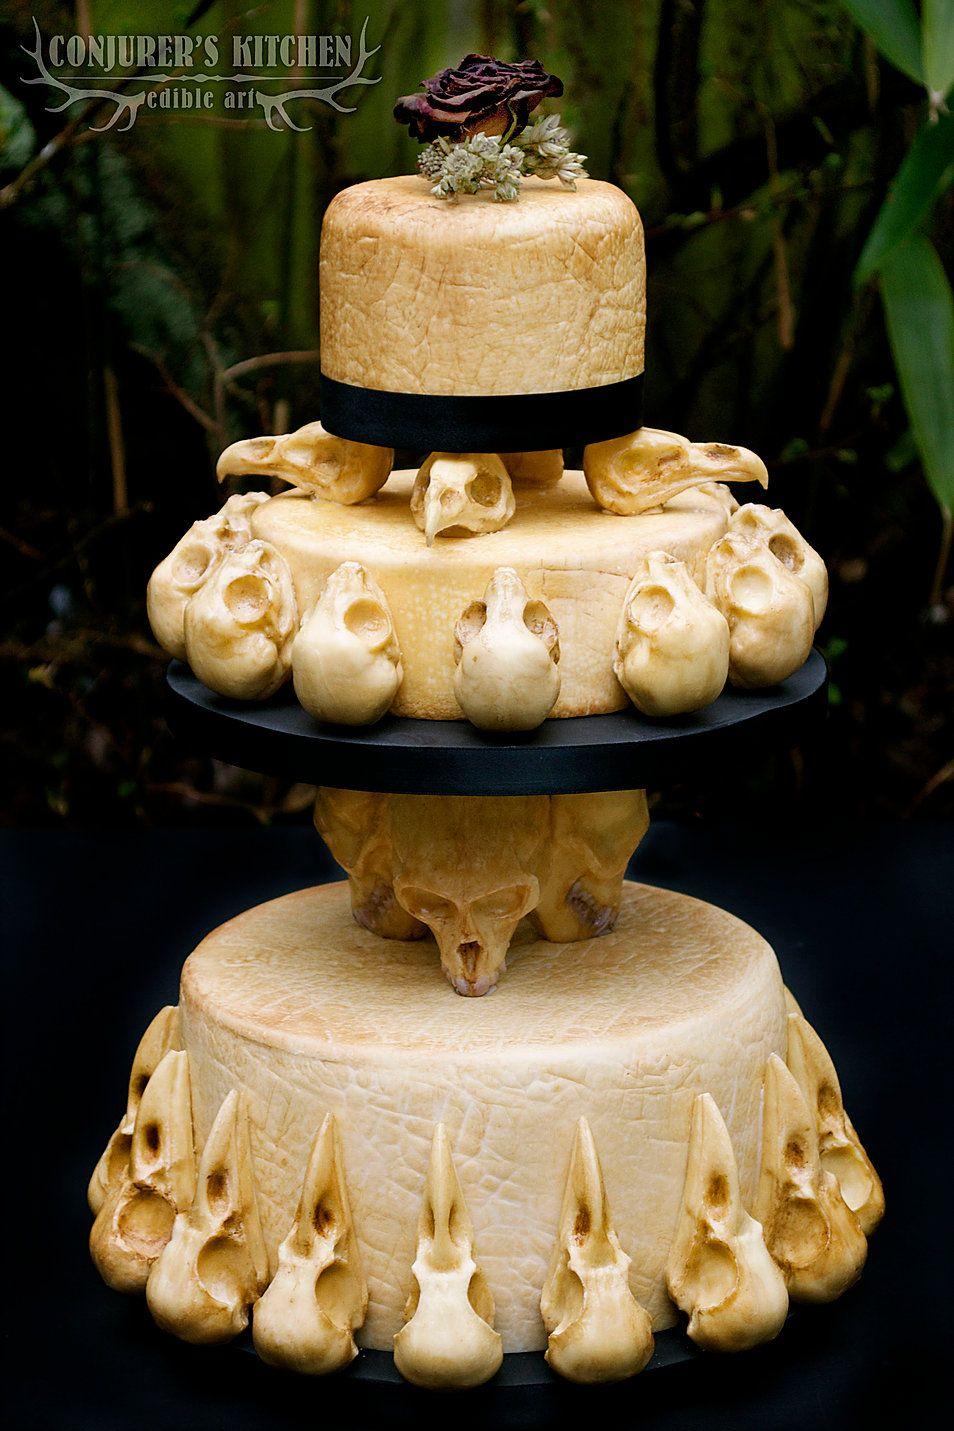 Food Art Birmingham Conjurer's Kitchen Cakes The